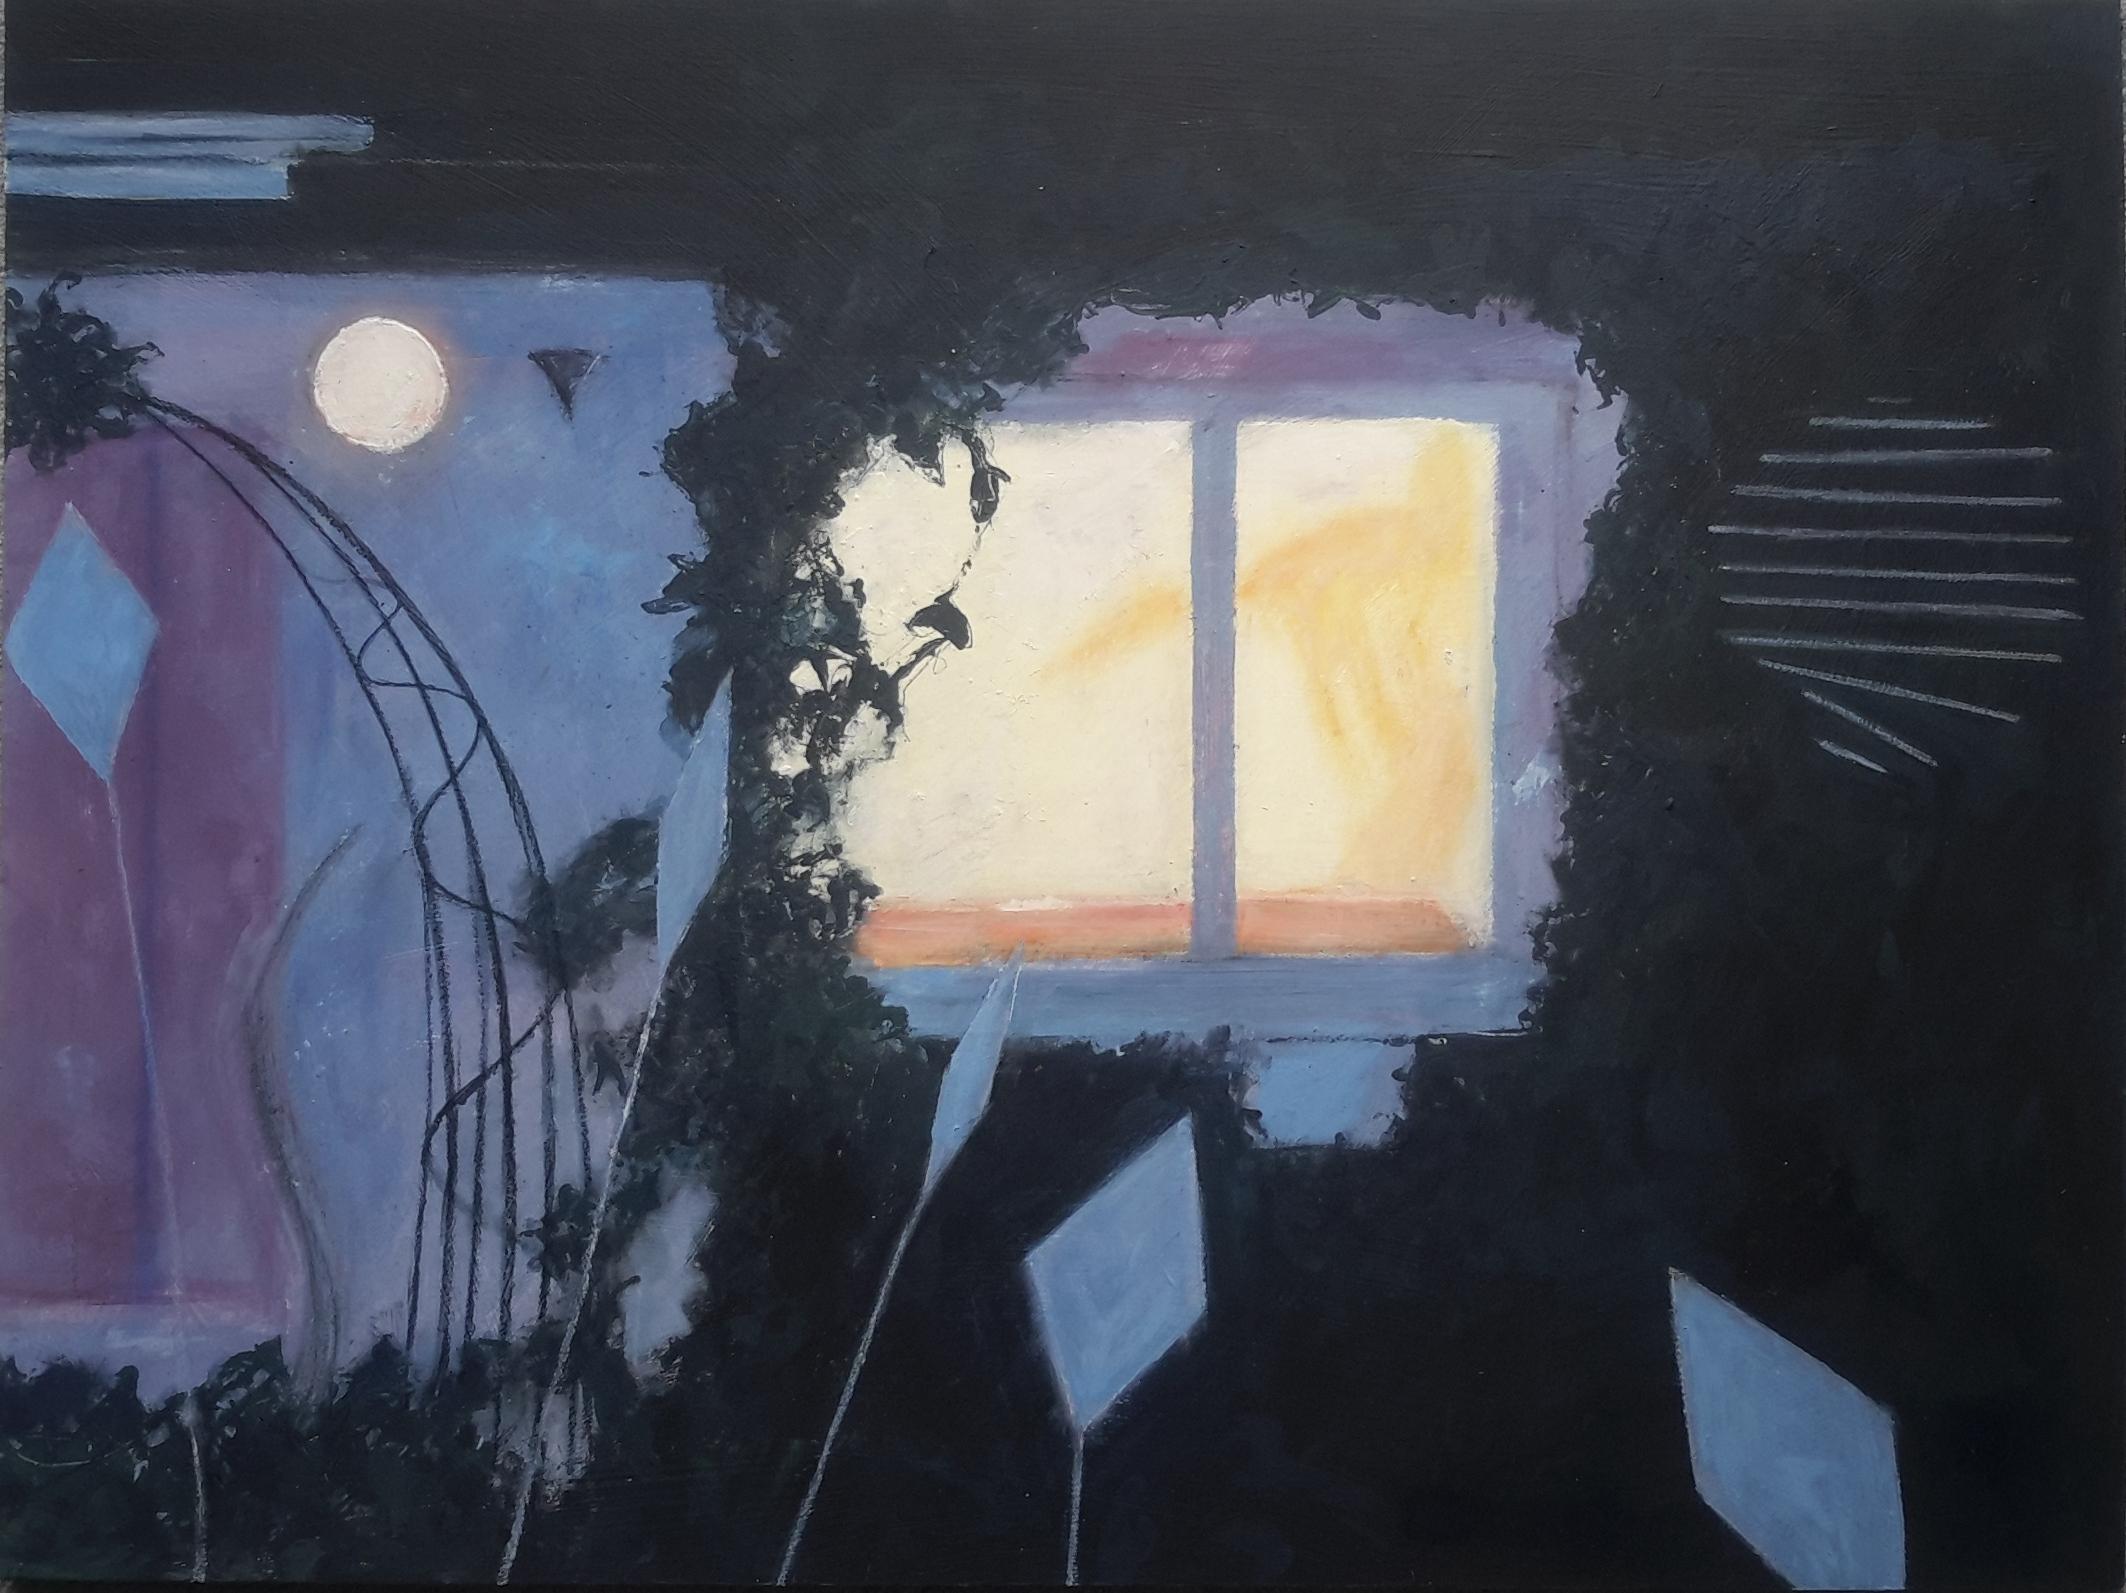 Jill Tattersall In the Night Garden 65x86, mixed media on board (1)